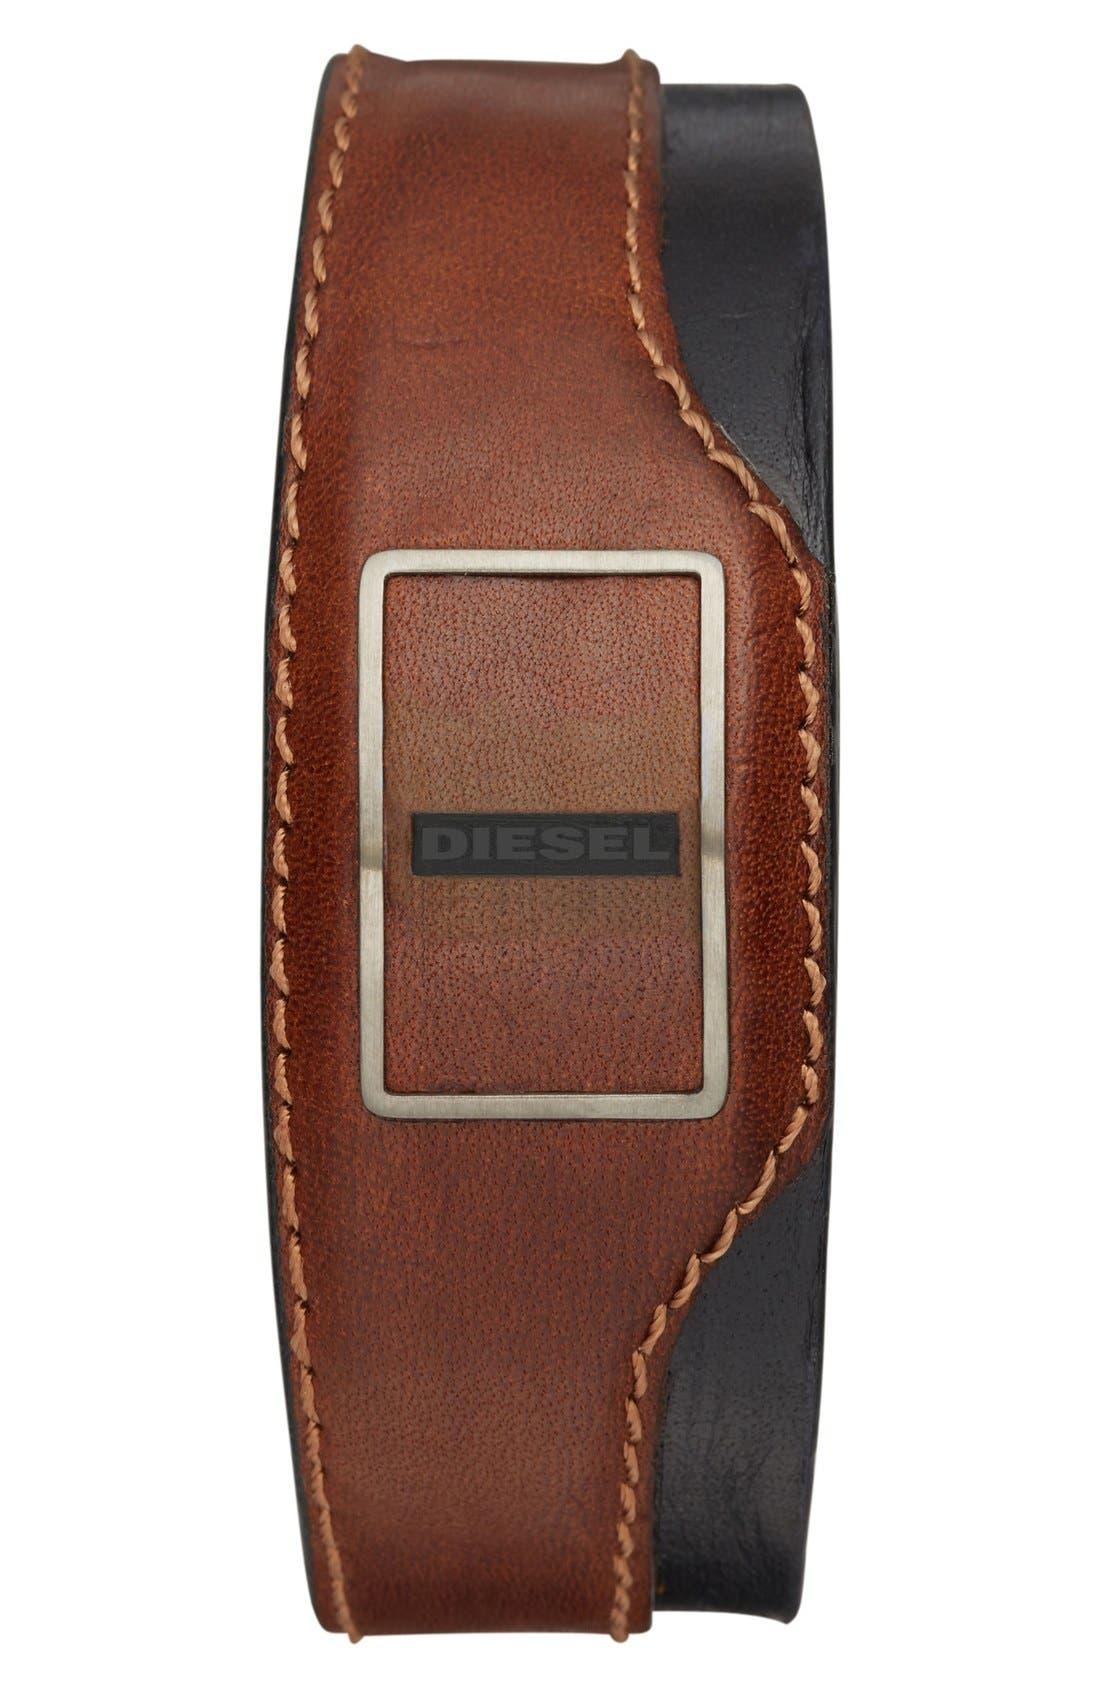 DIESEL® Leather Cuff Activity Tracker